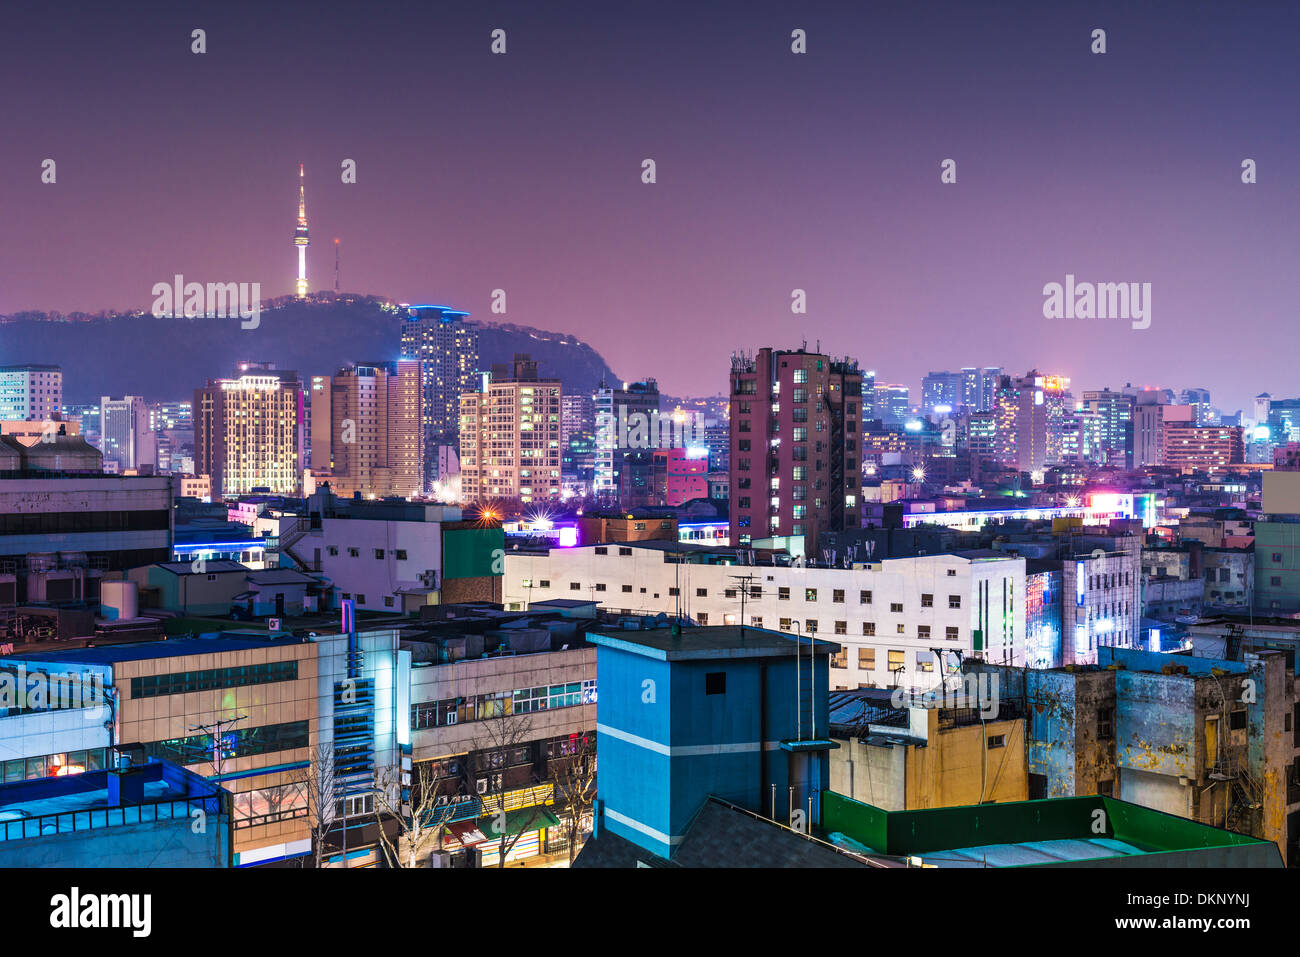 Seoul, South Korea skyline with Seoul Tower. - Stock Image